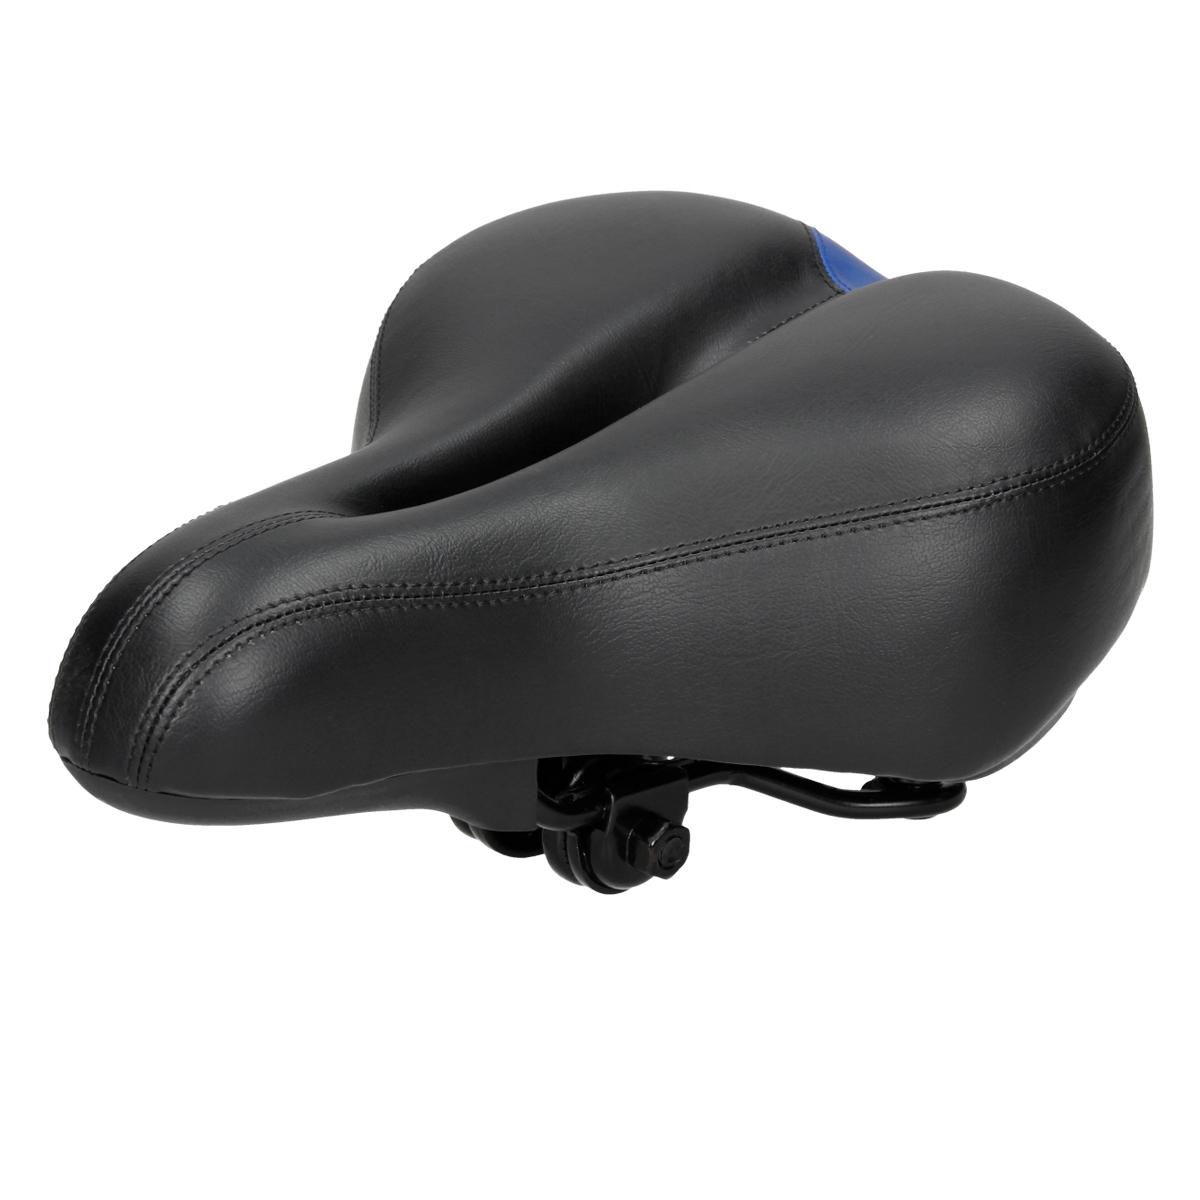 fahrradsattel fahhrad sattel fahrradsitz tourensattel. Black Bedroom Furniture Sets. Home Design Ideas